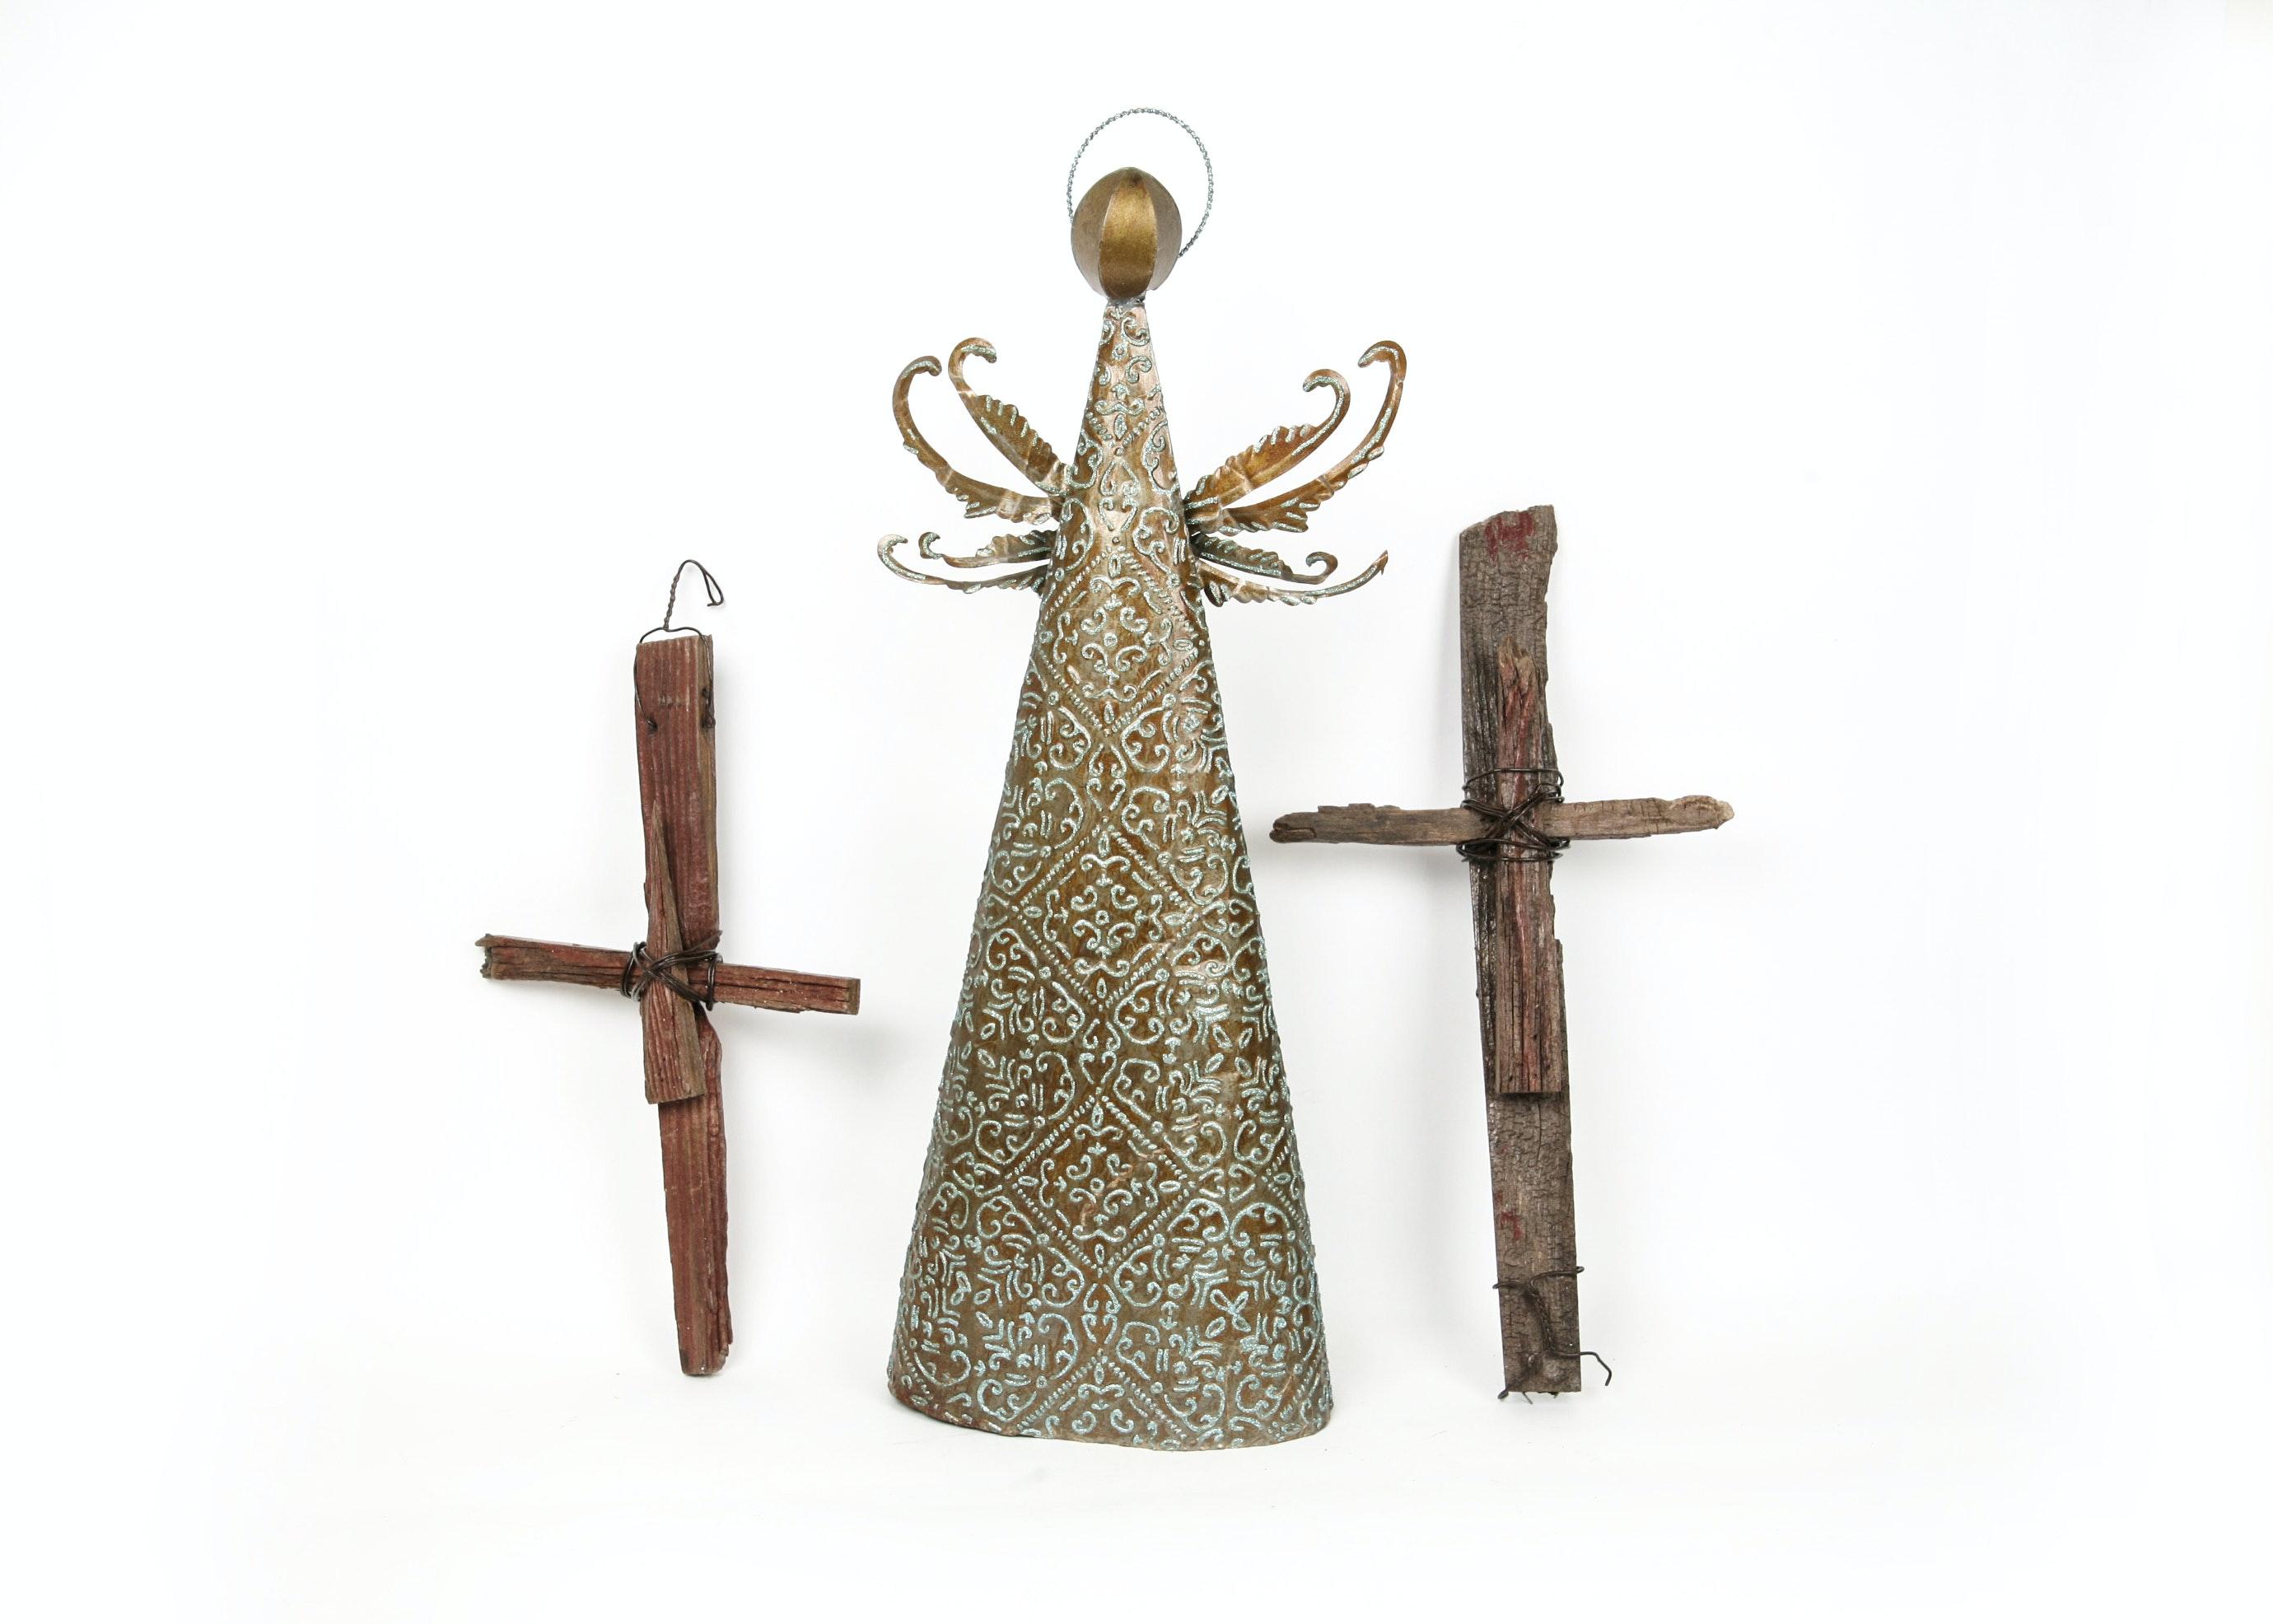 Vintage Angel and Cross Decor